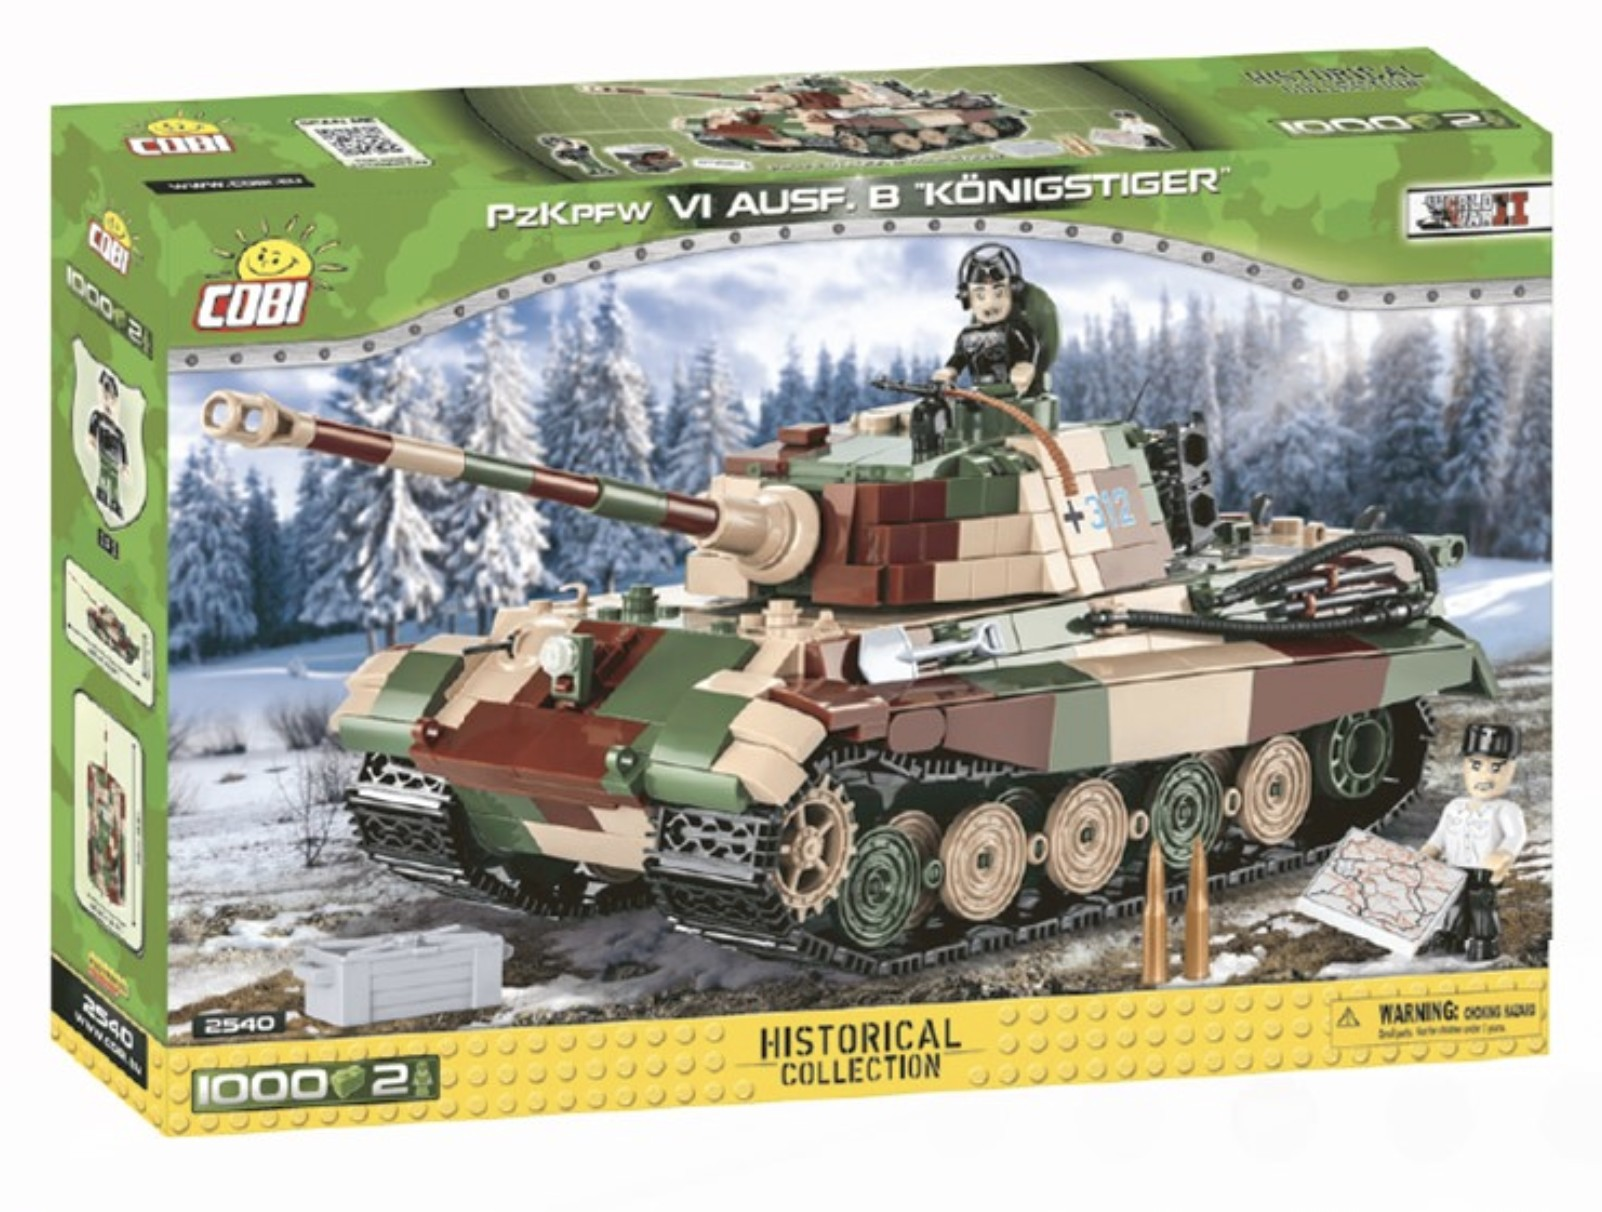 2540 - Panzerkampfwagen VI Ausf. B Königstiger